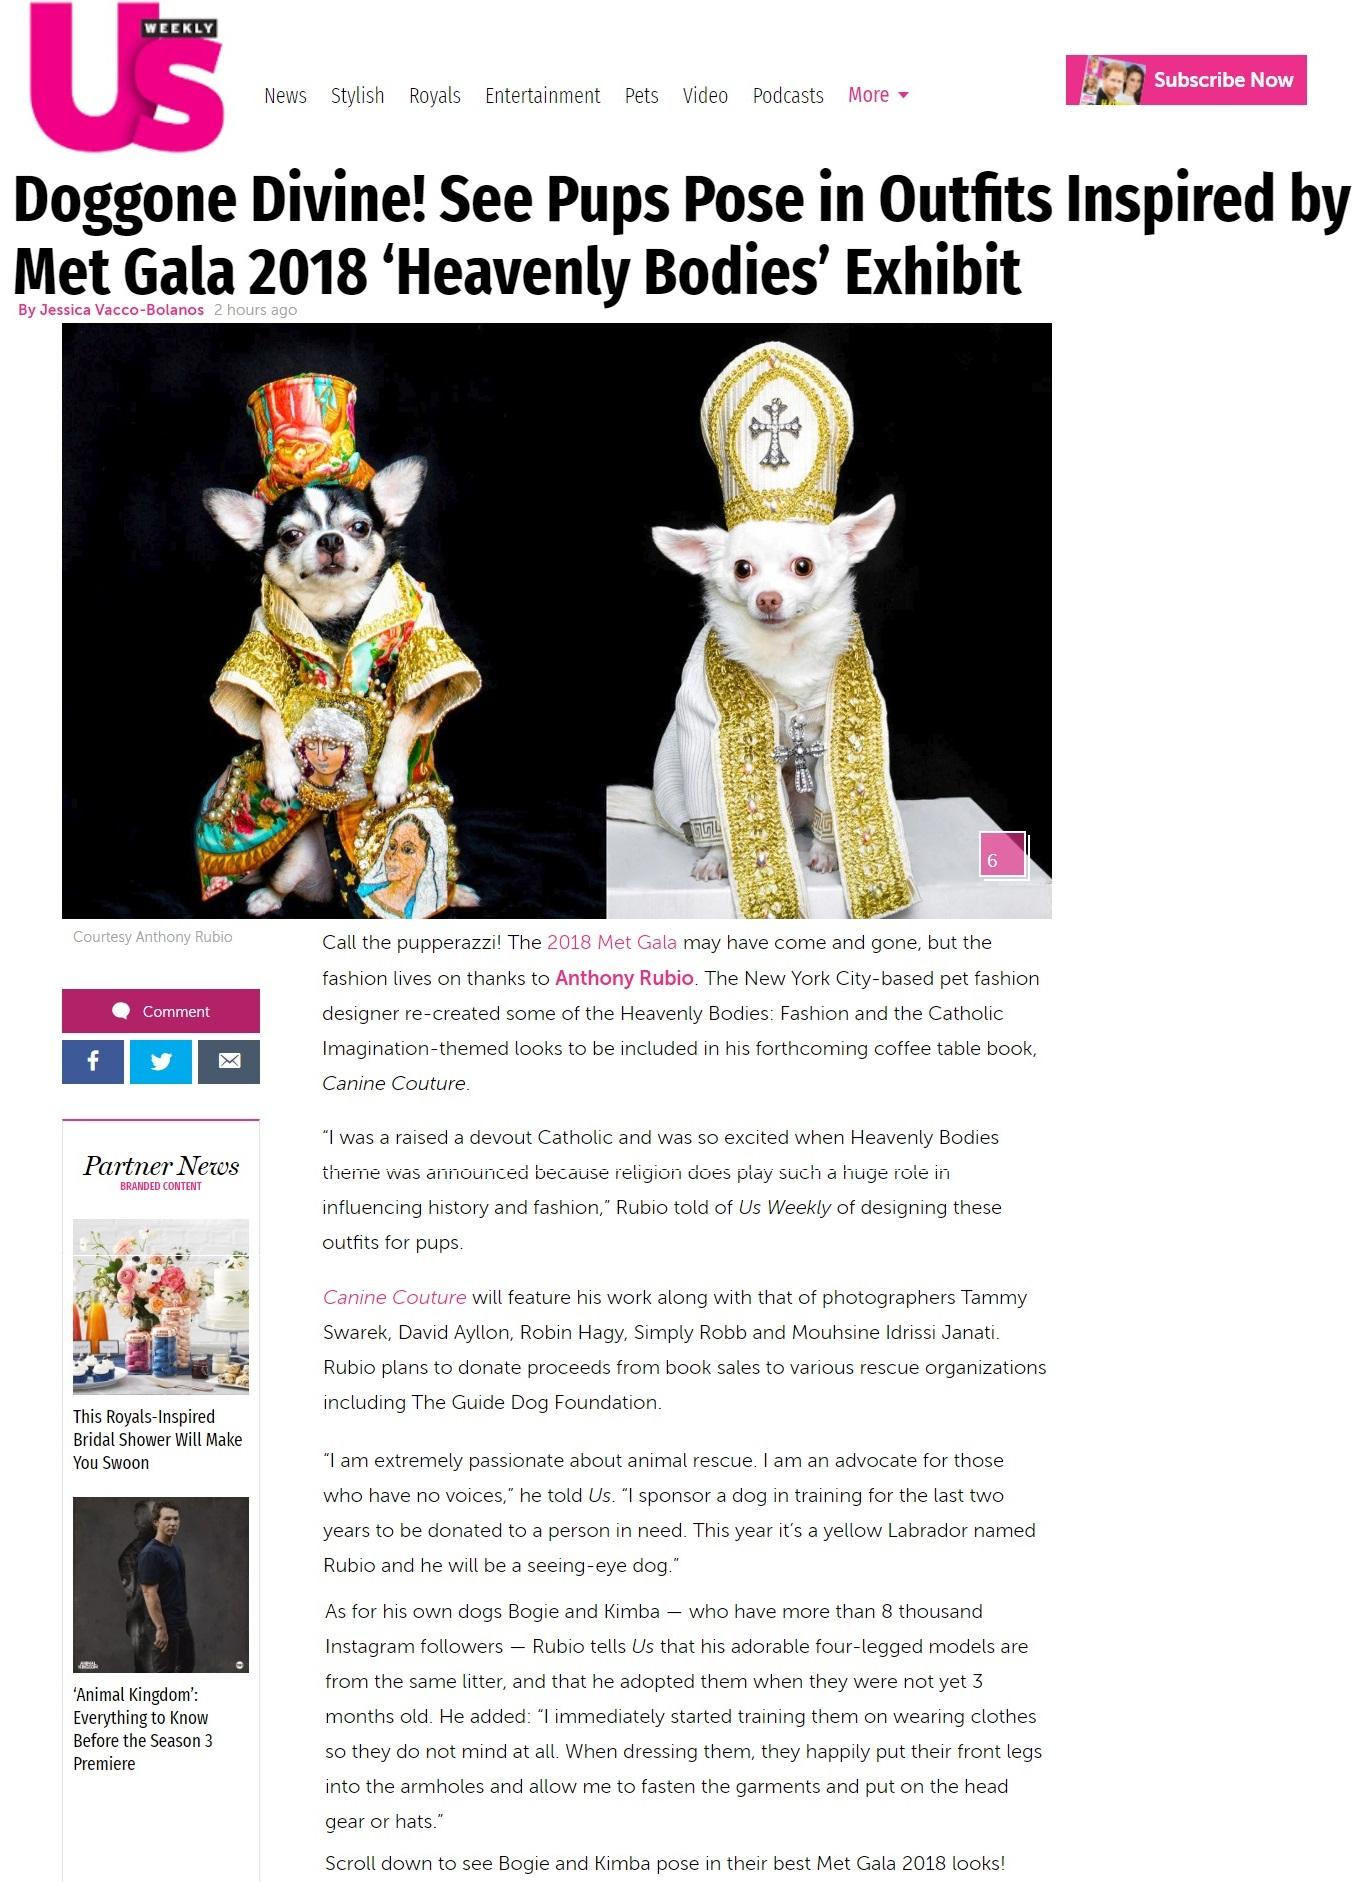 Anthony Rubio, Met Gala 2018, Heavenly Bodies, Dog Fashion,  5501 new 100.jpg